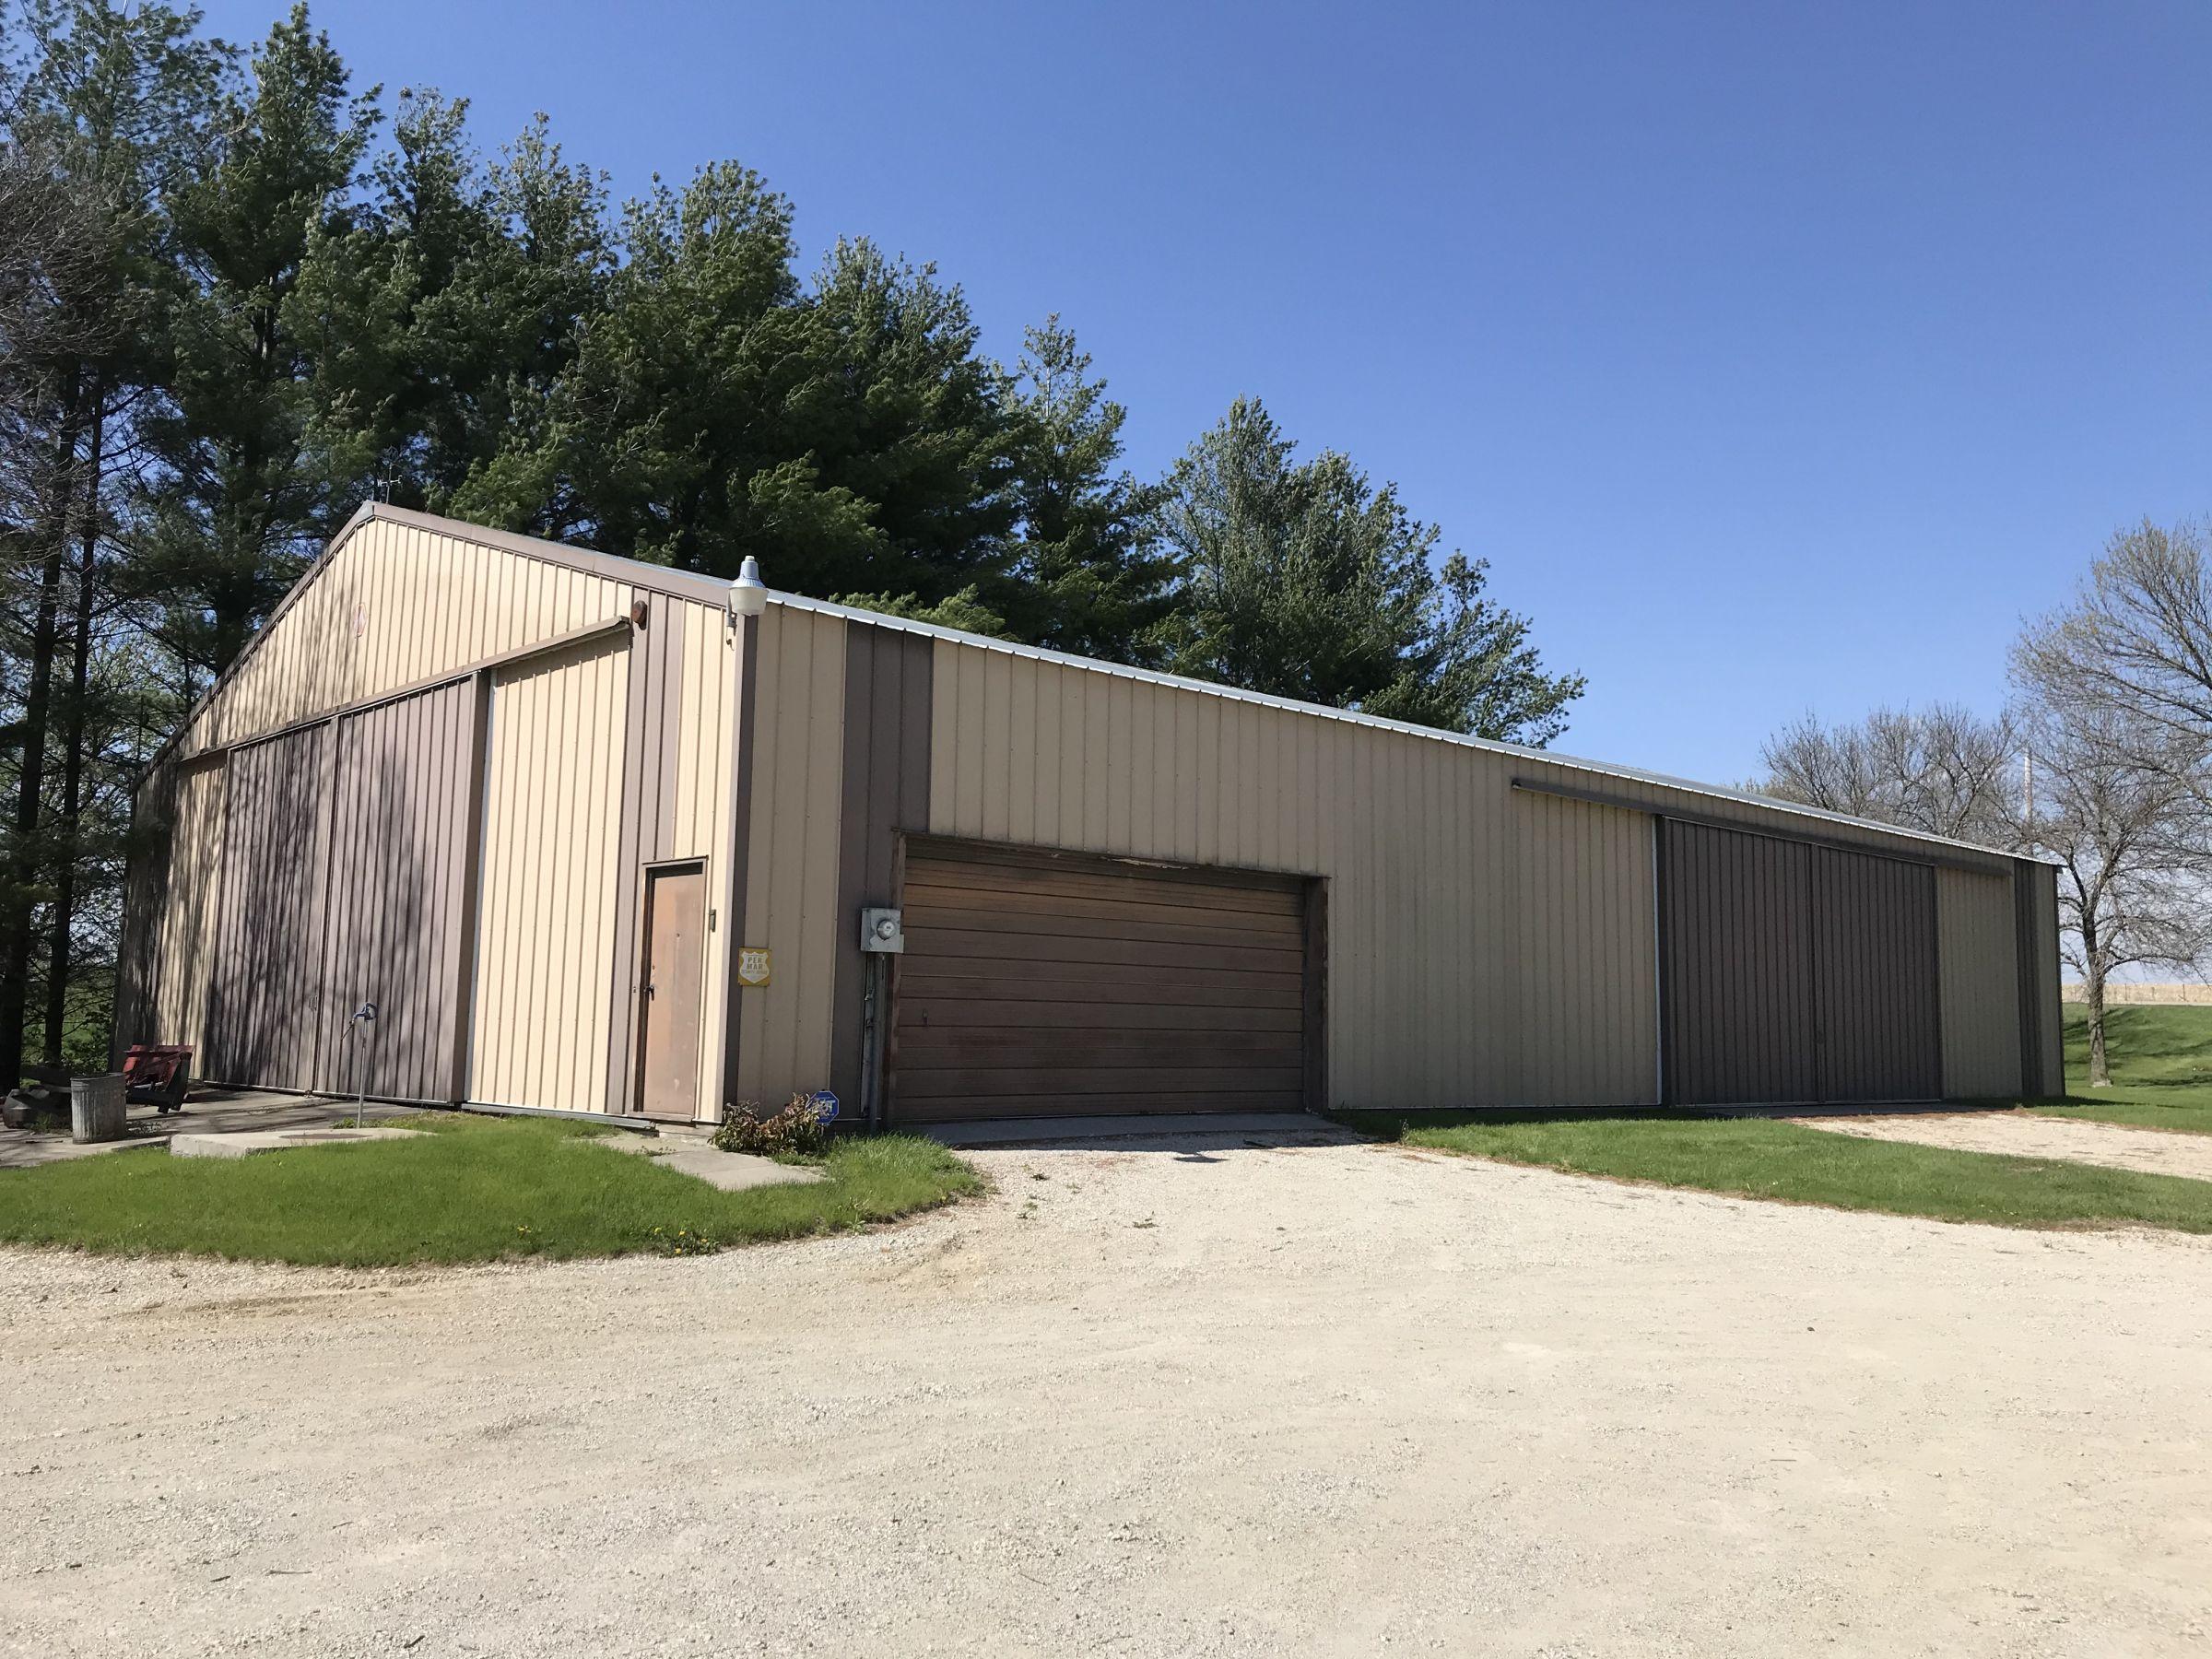 residential-polk-county-iowa-34-acres-listing-number-15502-4-2021-04-29-144019.jpg